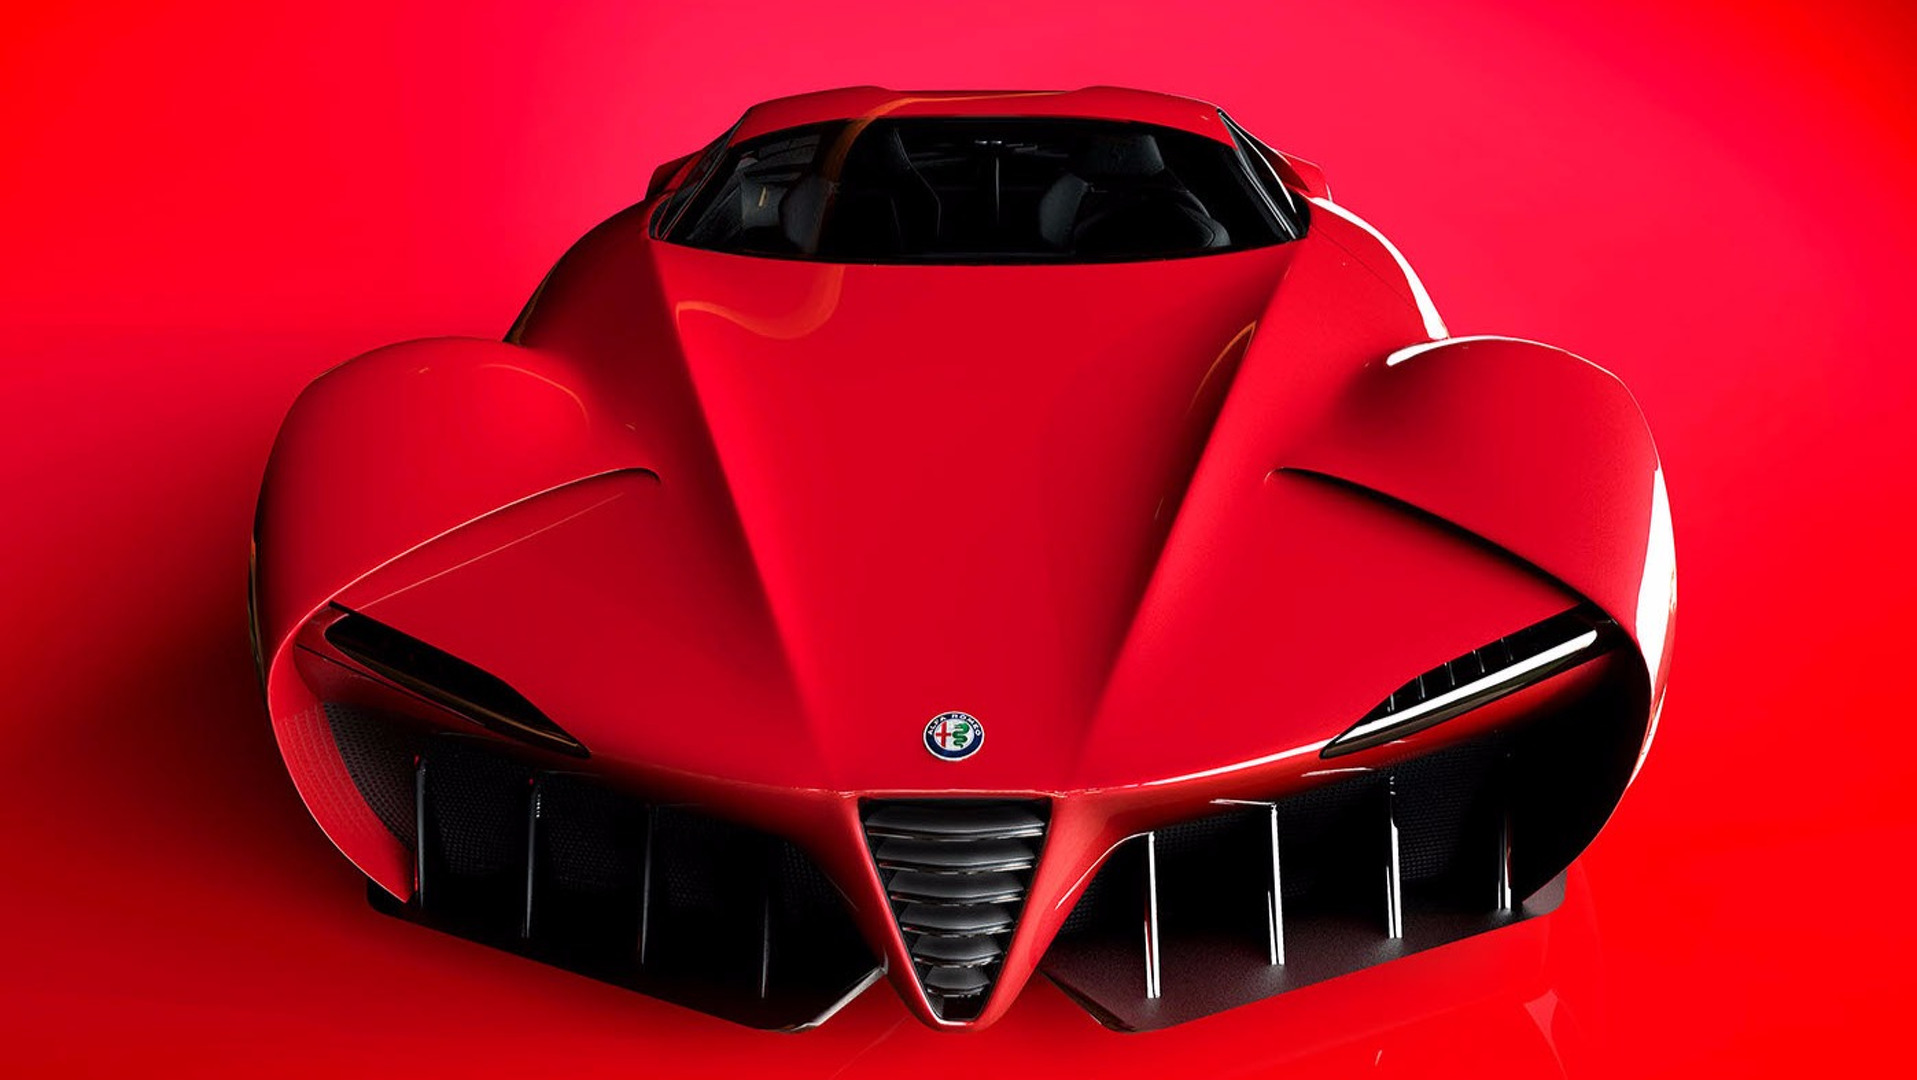 Alfa Romeo Disco Volante >> Alfa Romeo 6c Konsepti Modern Bir Disco Volante Ye Benziyor